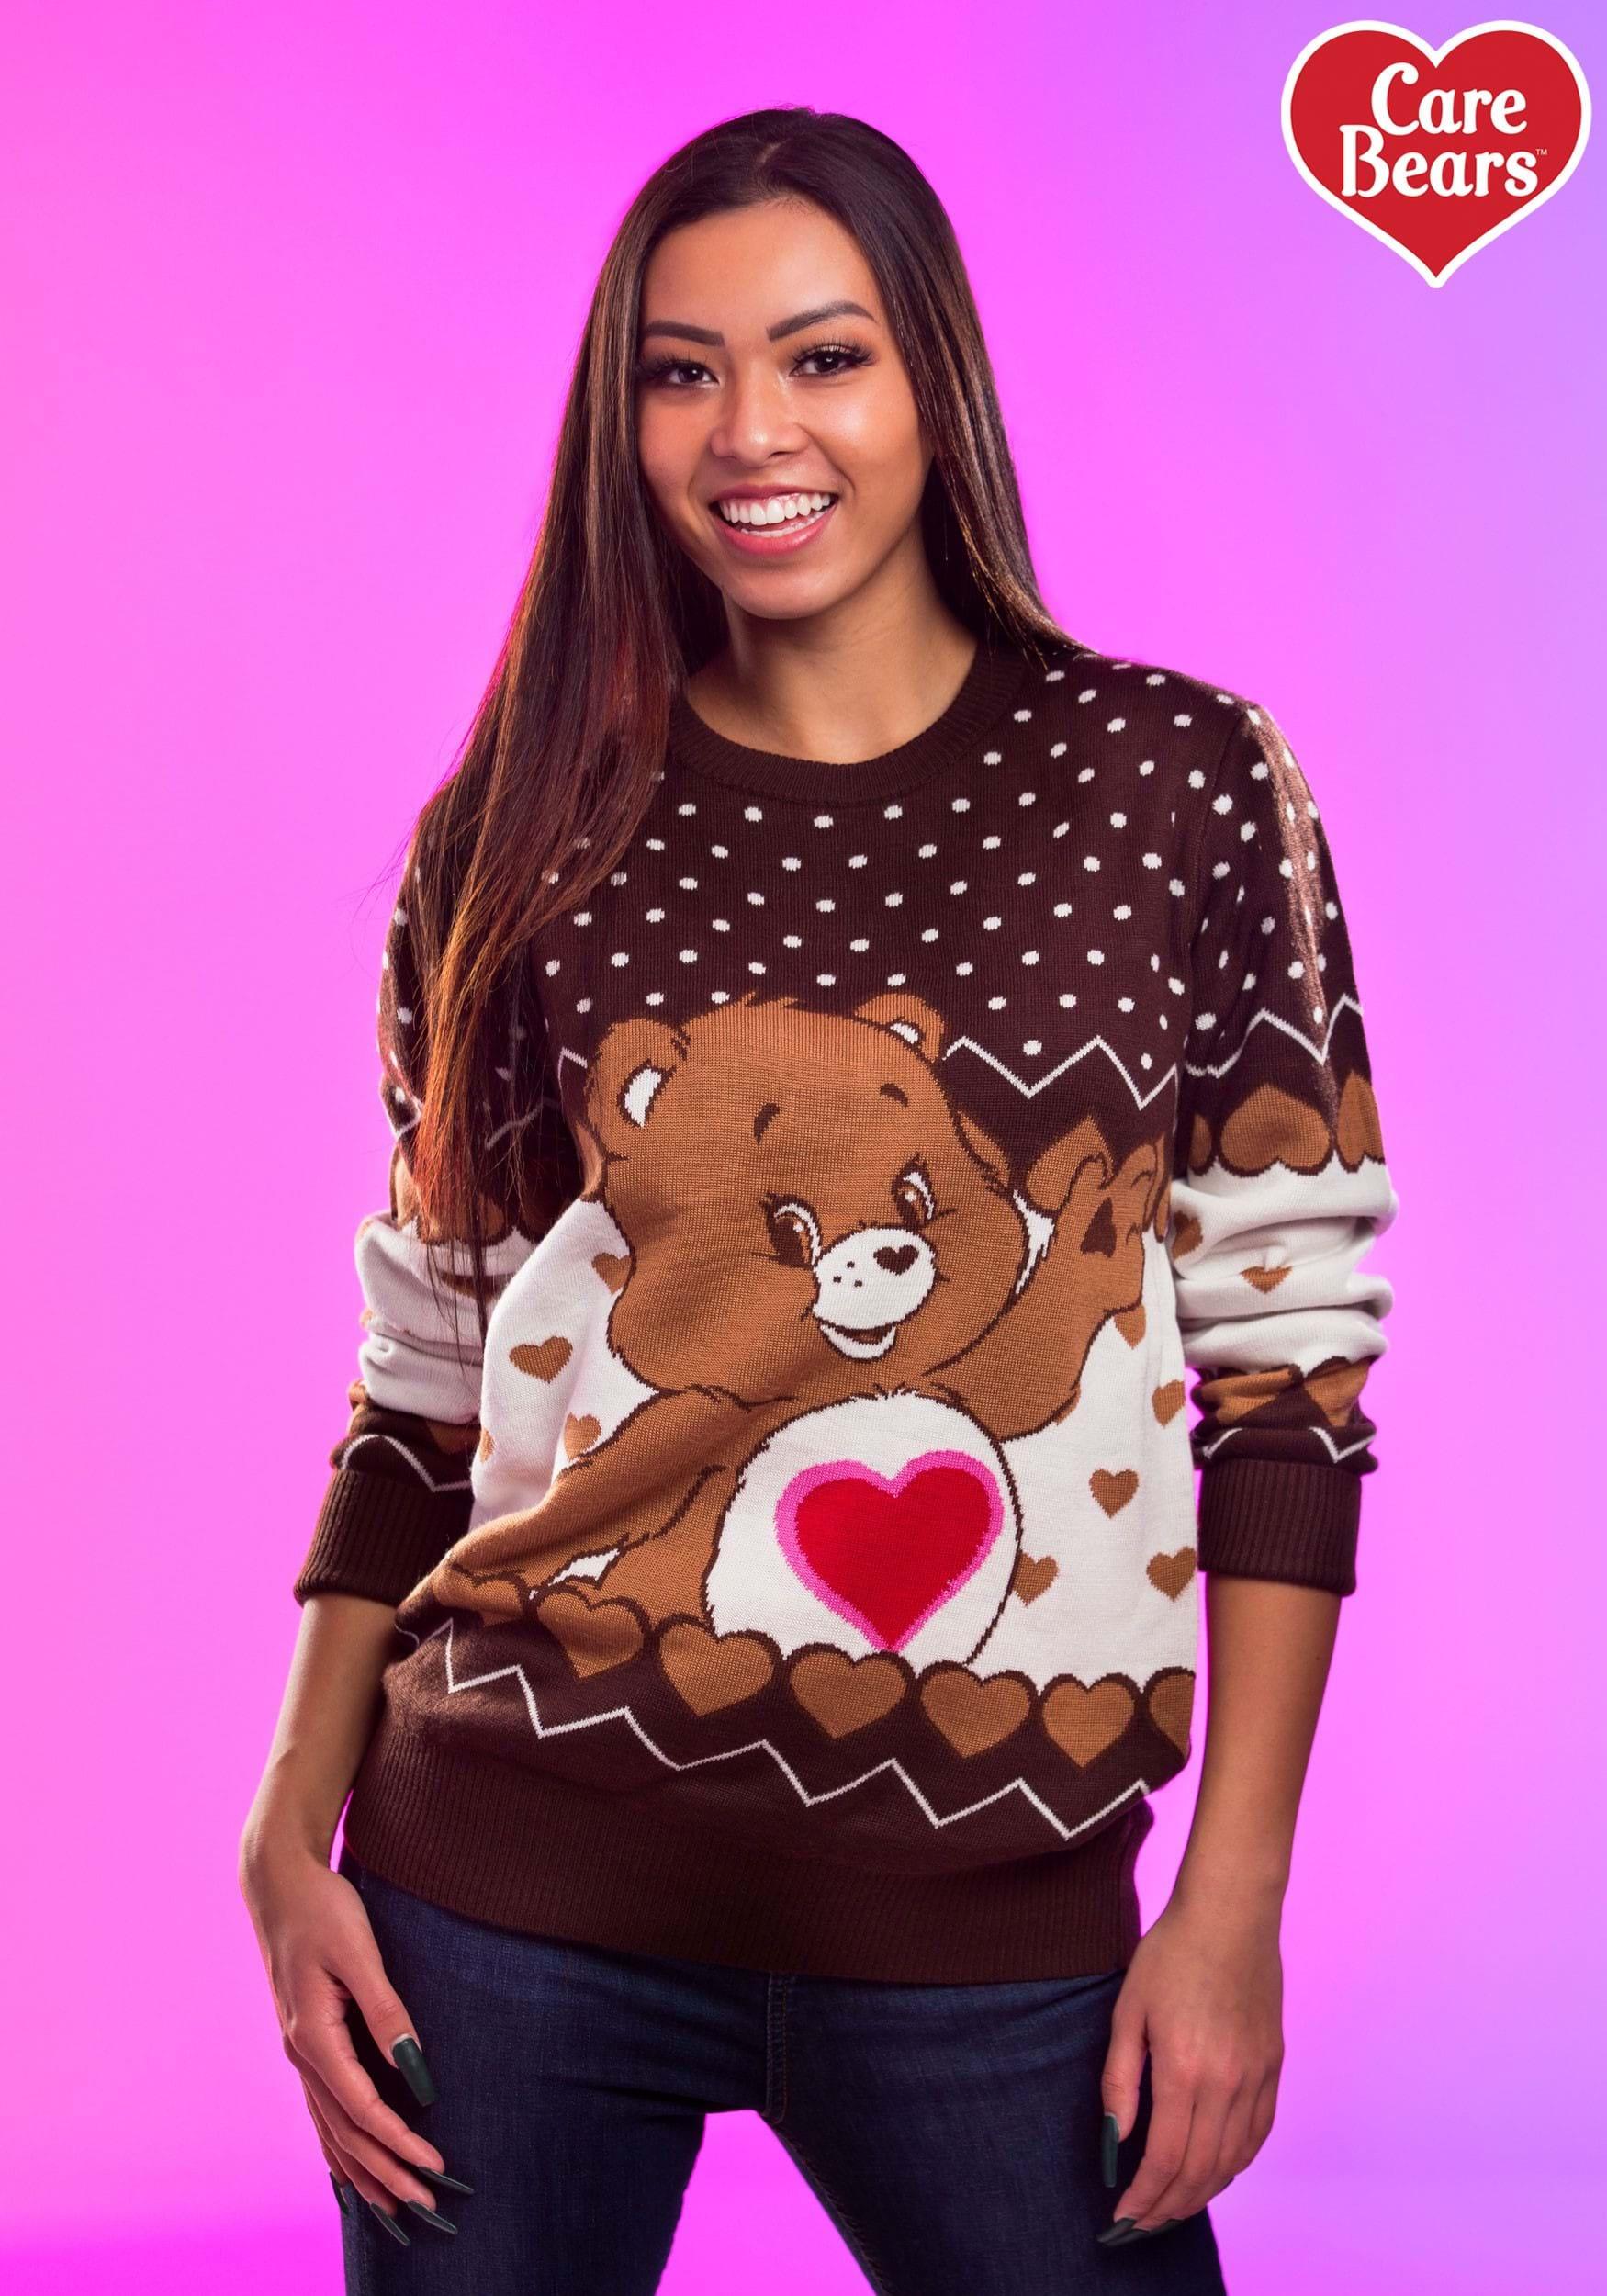 3x Ugly Christmas Sweater.Tenderheart Bear Adult Care Bears Ugly Christmas Sweater